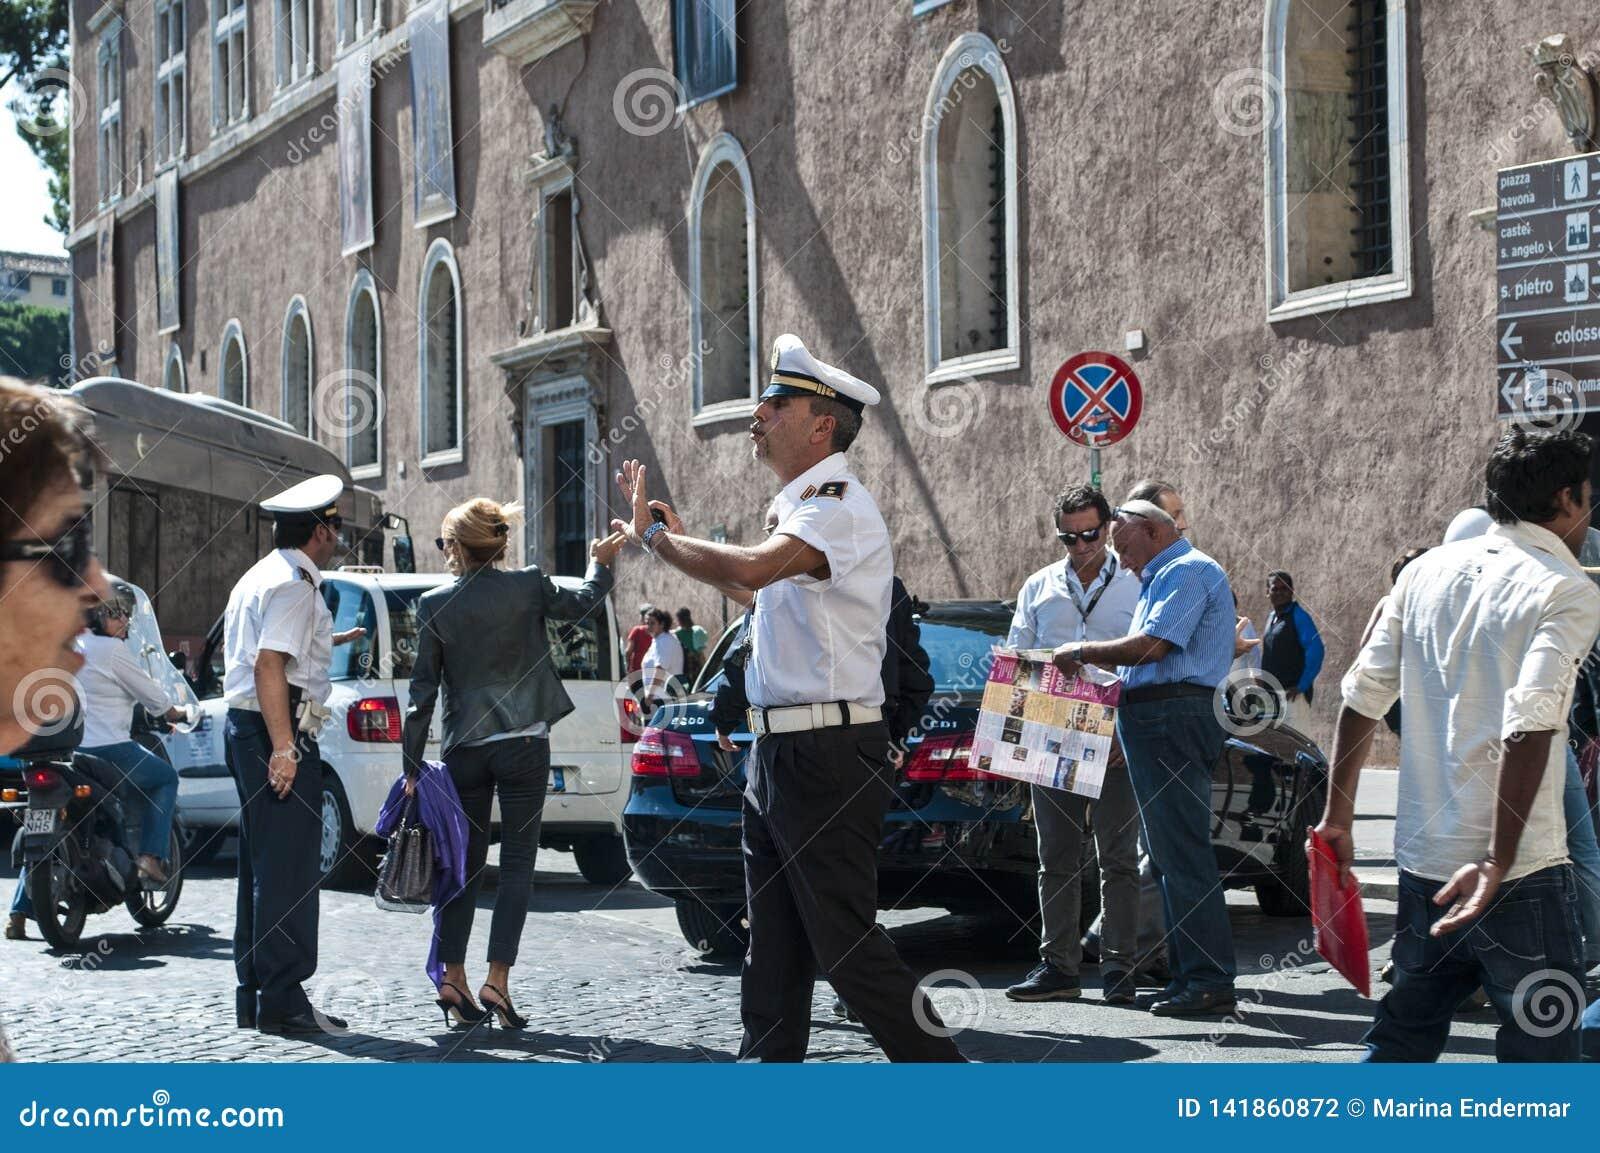 Policier italien gesticulant, Piazza Venezia, Rome, Italie